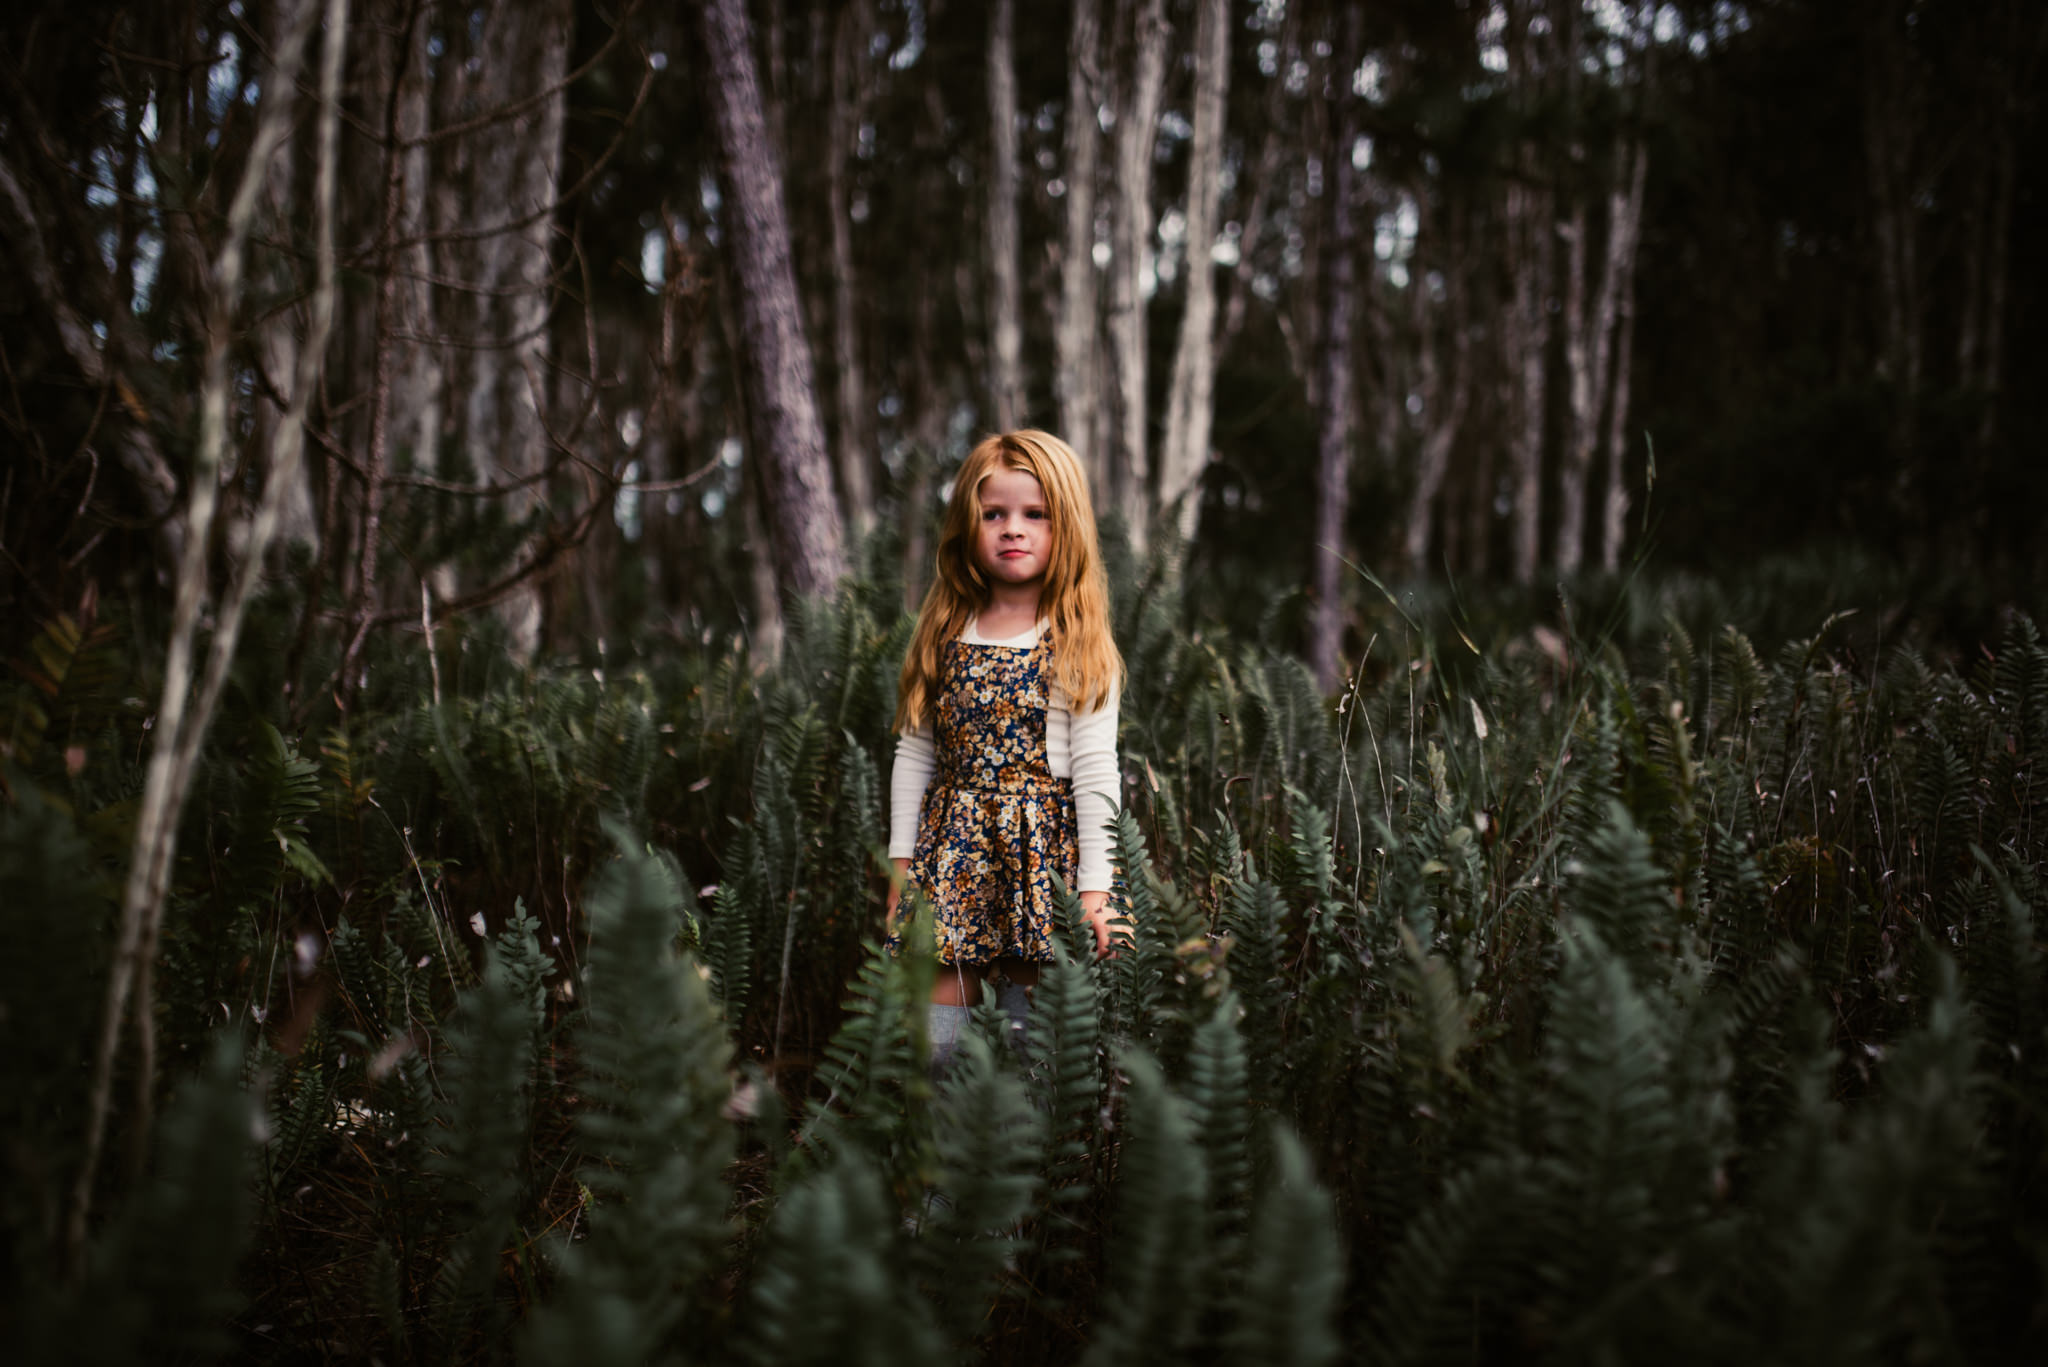 twyla jones photography - treasure coast florida - childrens adventure clothing commercial shoot--6.jpg